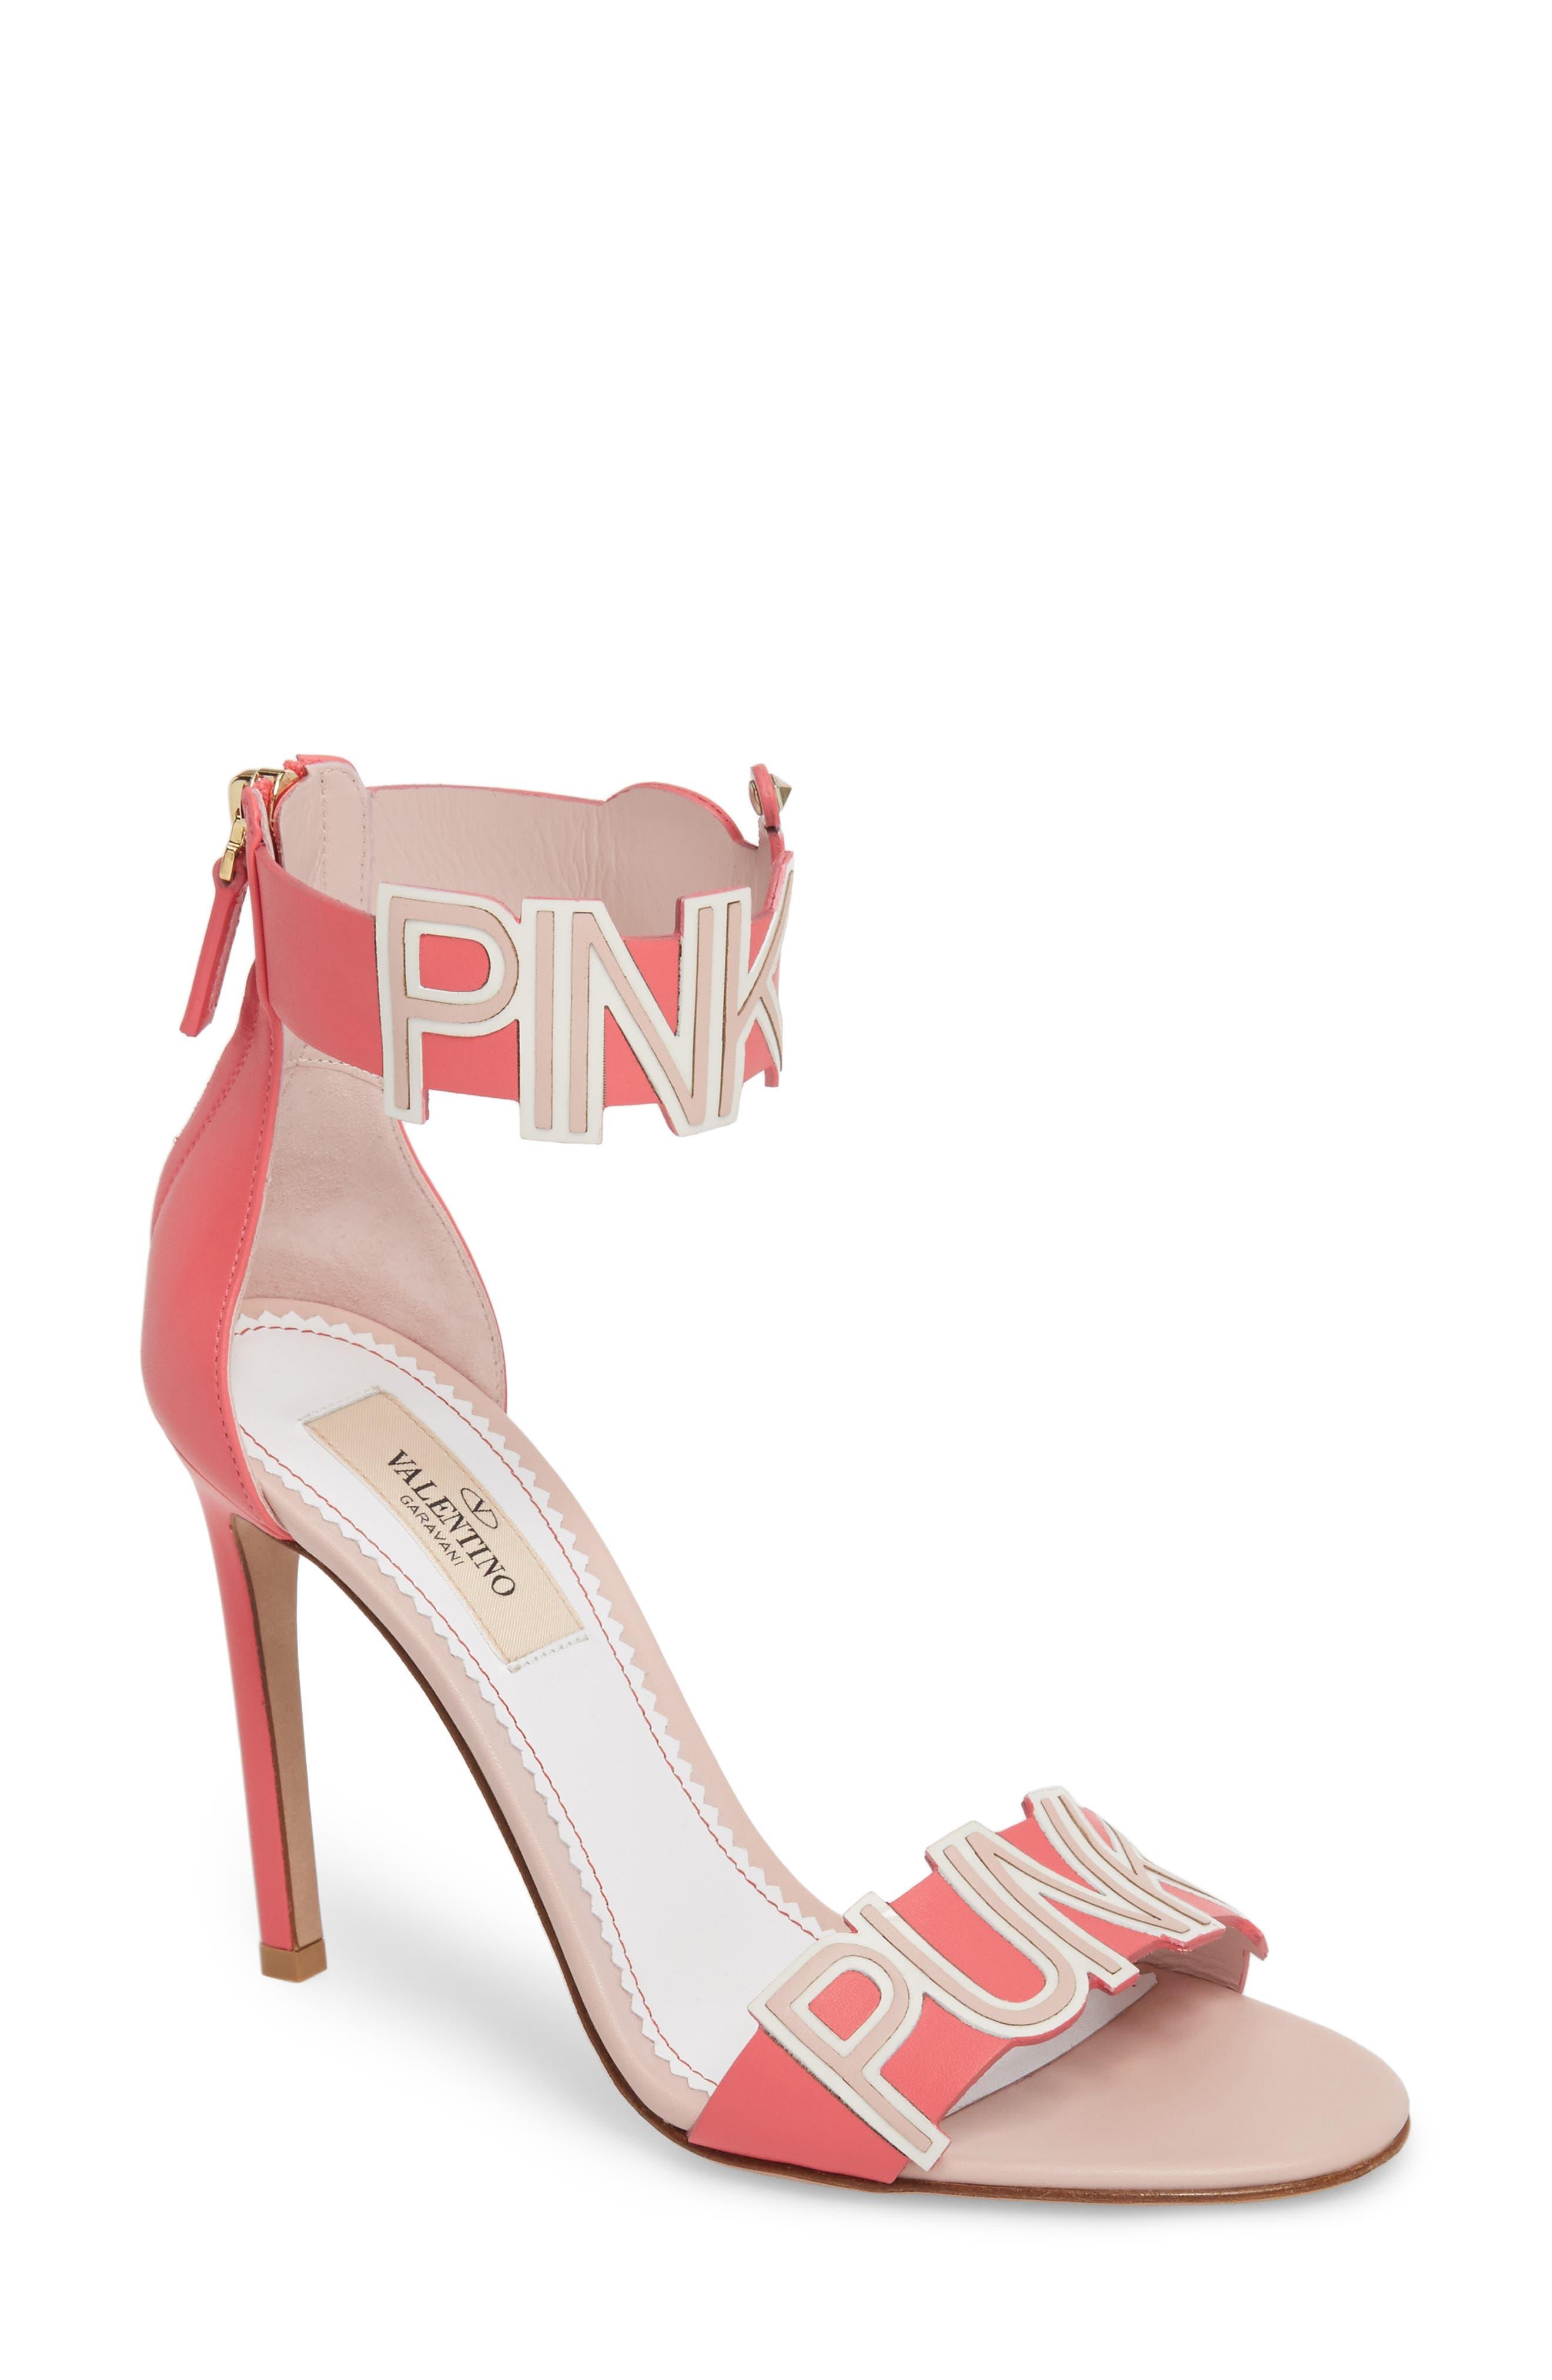 VALENTINO GARAVANI Pink Is Punk Ankle Strap Sandal (Women)